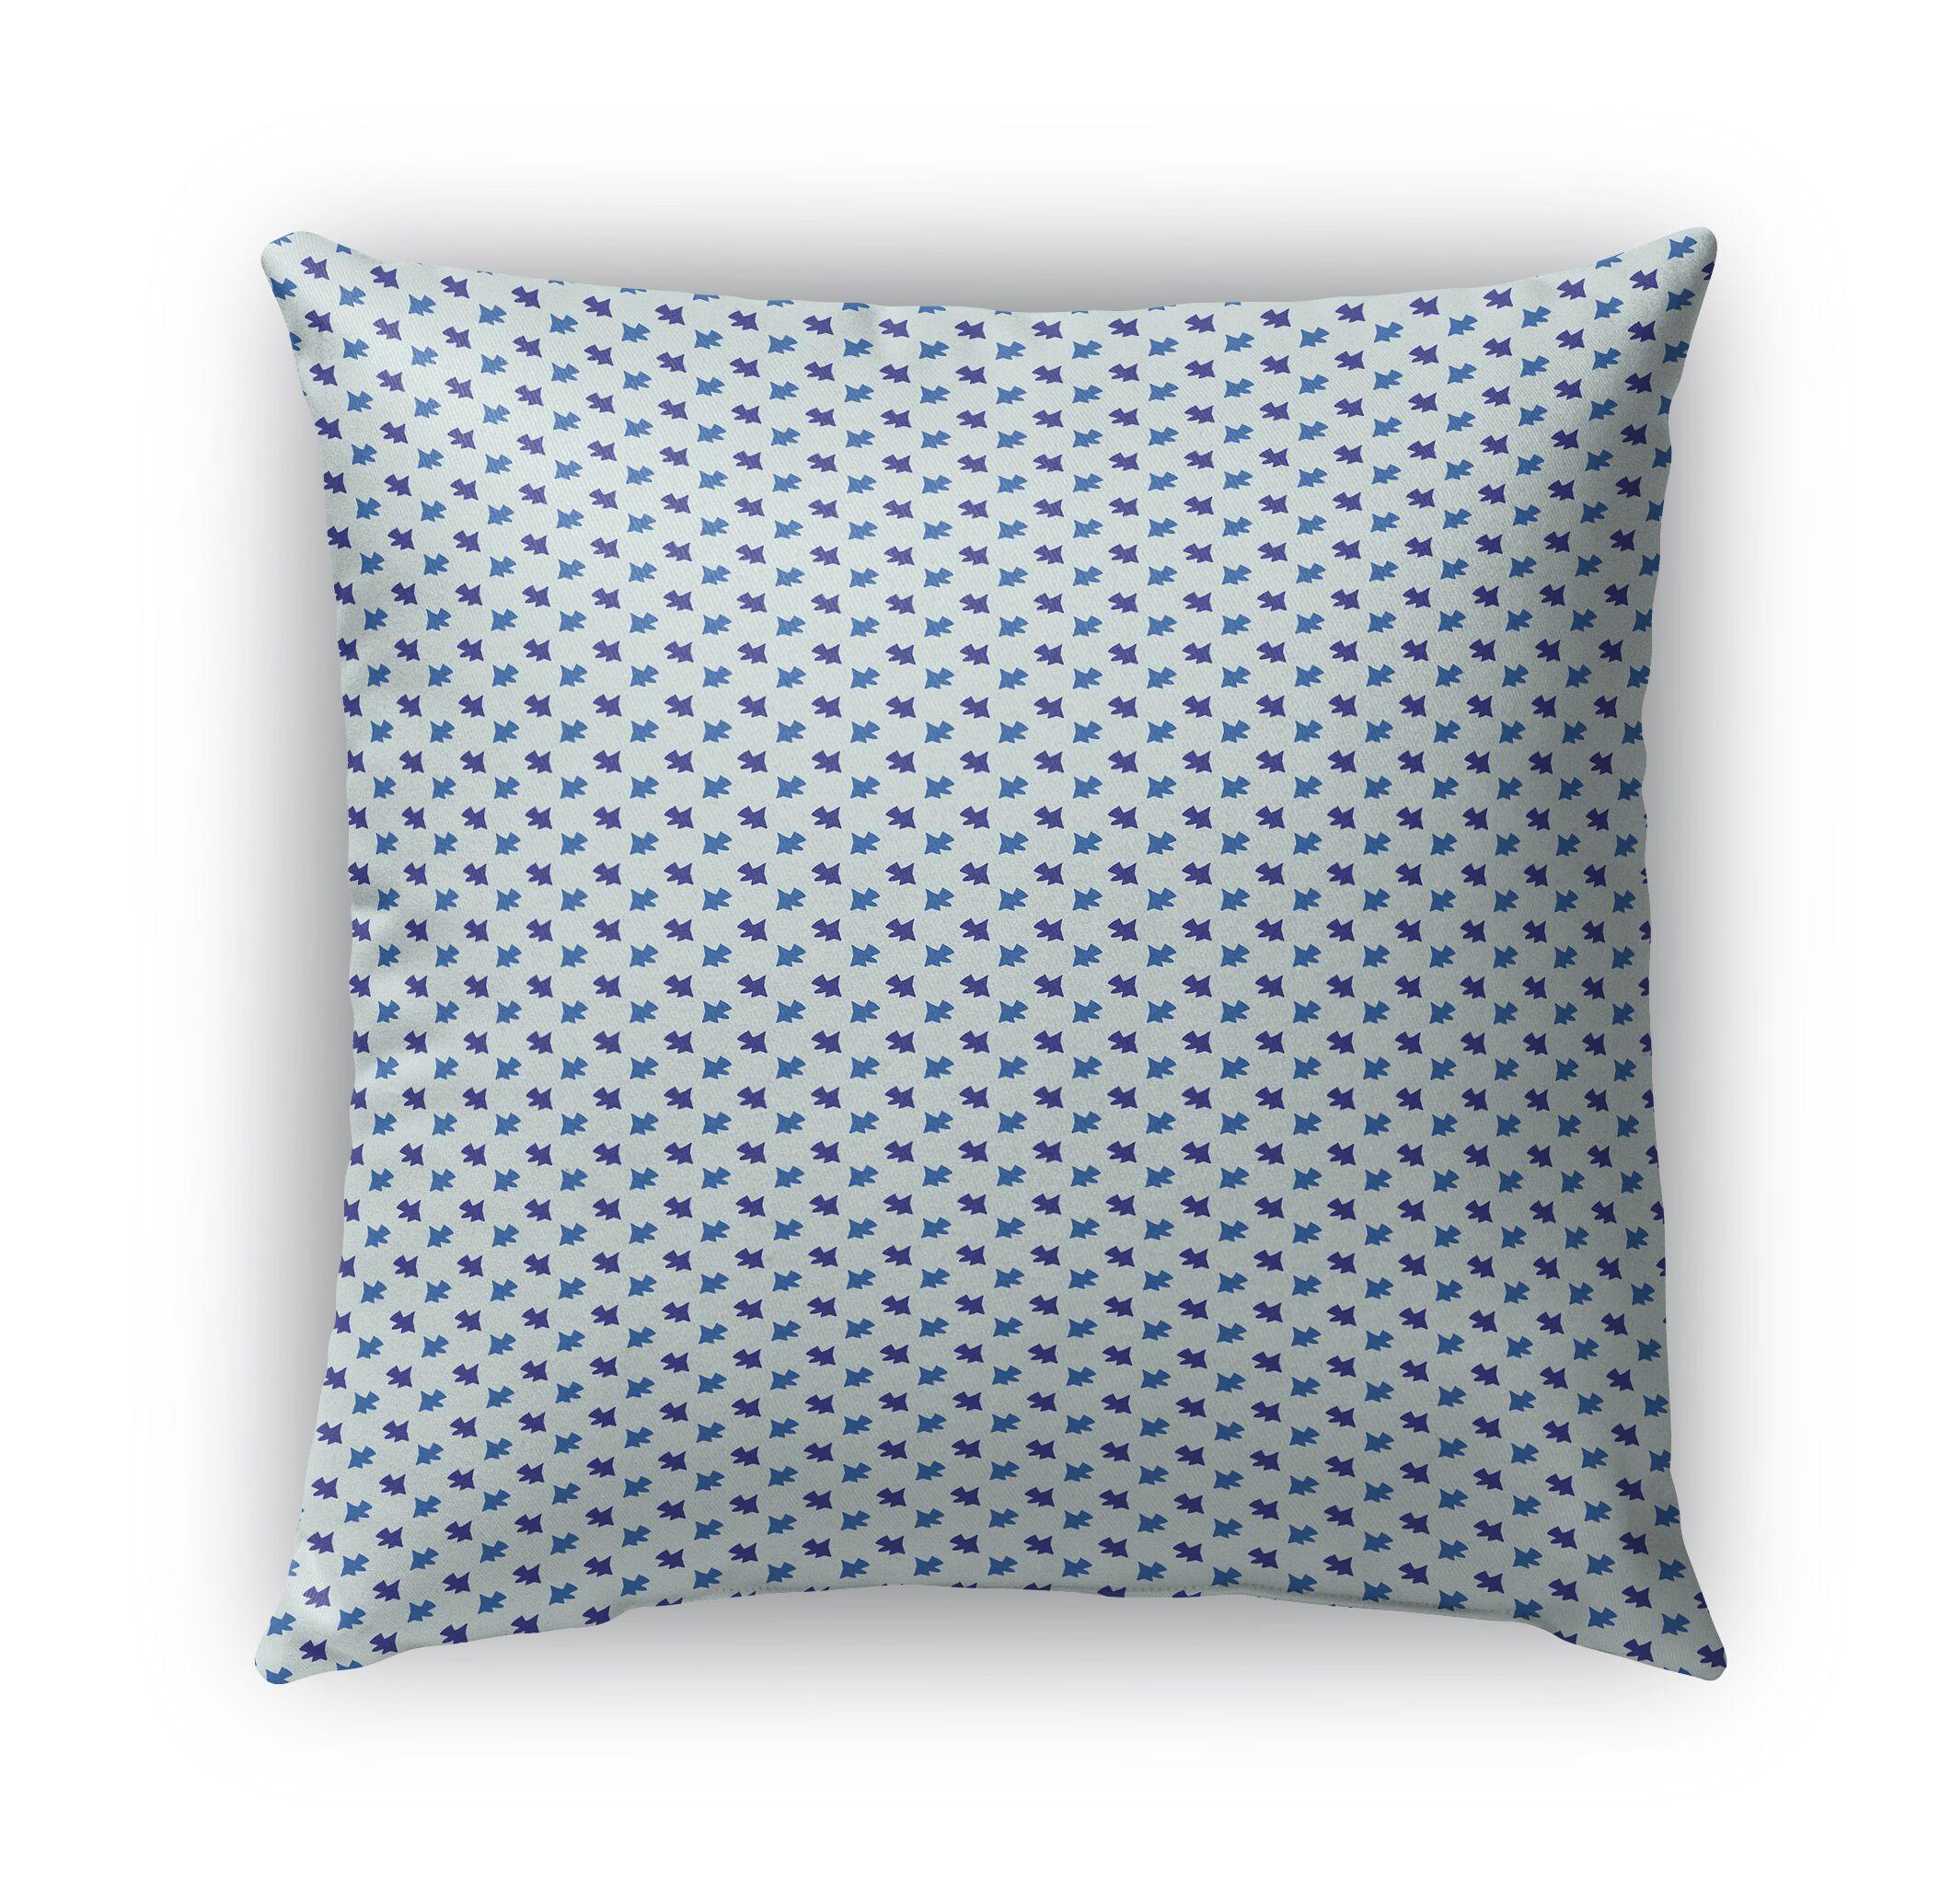 Cutrer Pattern Indoor/Outdoor Throw Pillow Size: 26